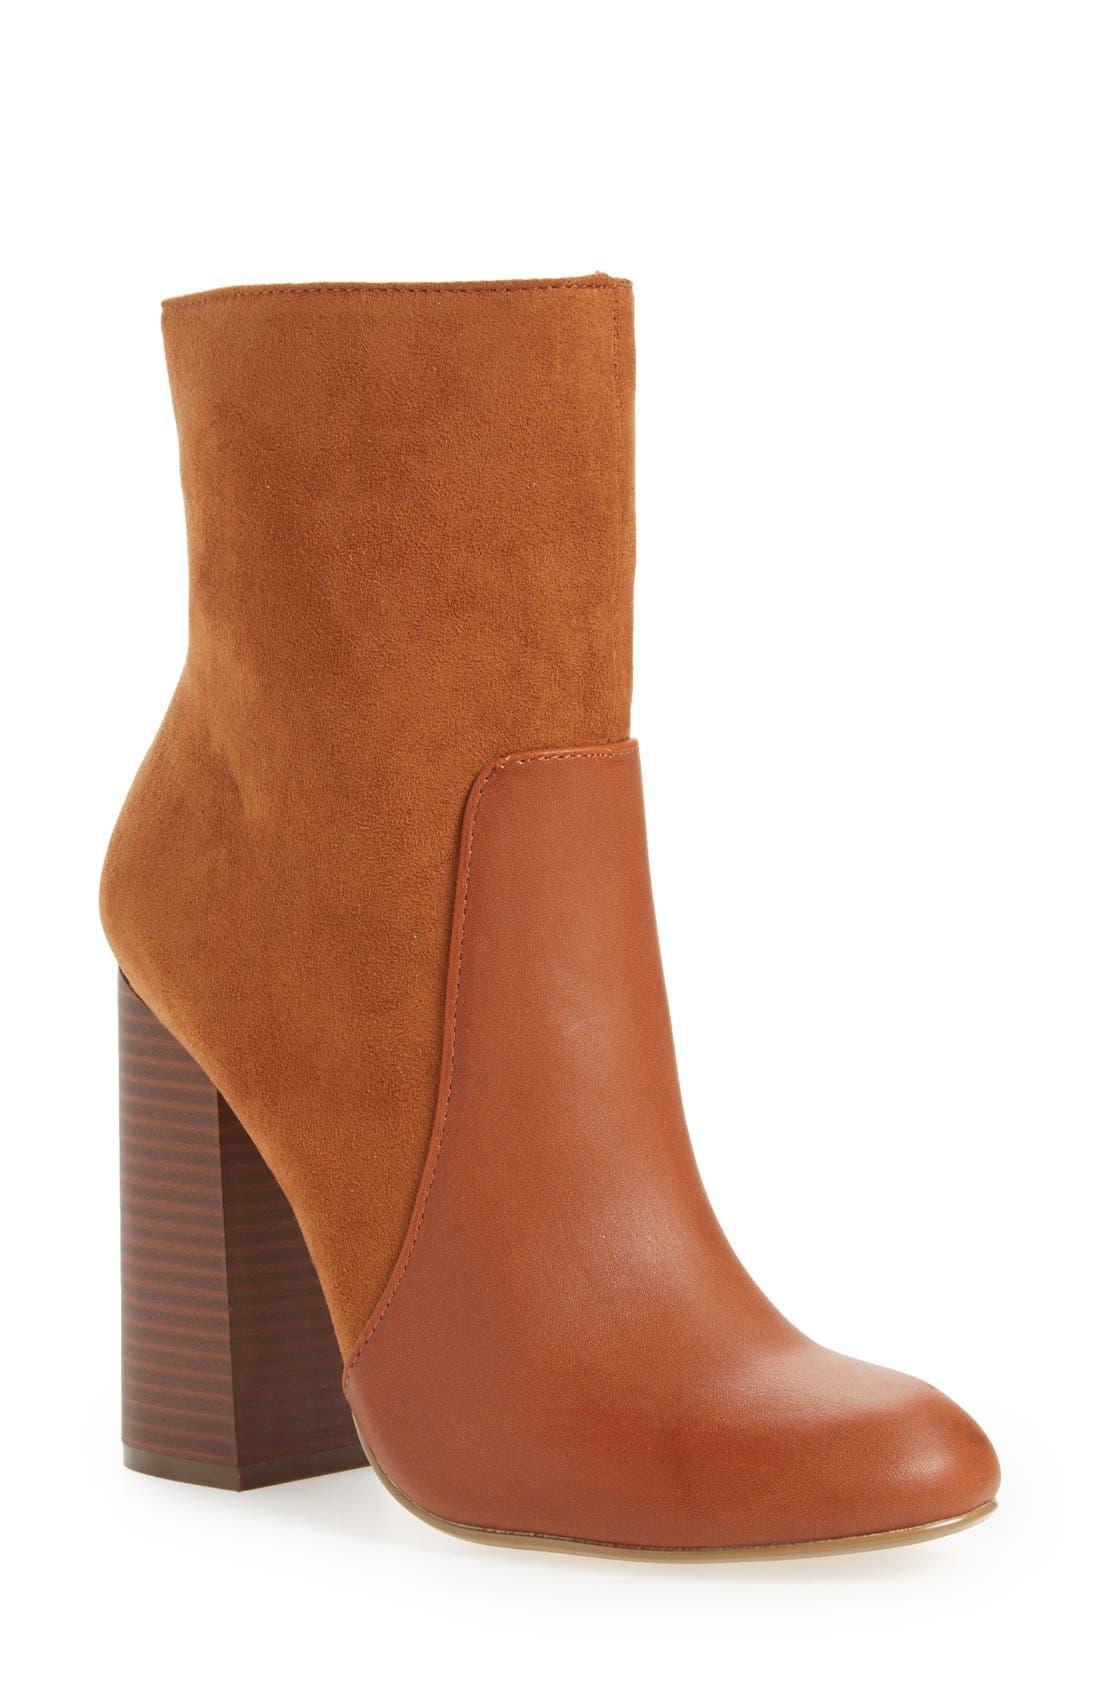 Alternate Image 1 Selected - Athena Alexander 'Farren' Mid Calf Boot (Women)